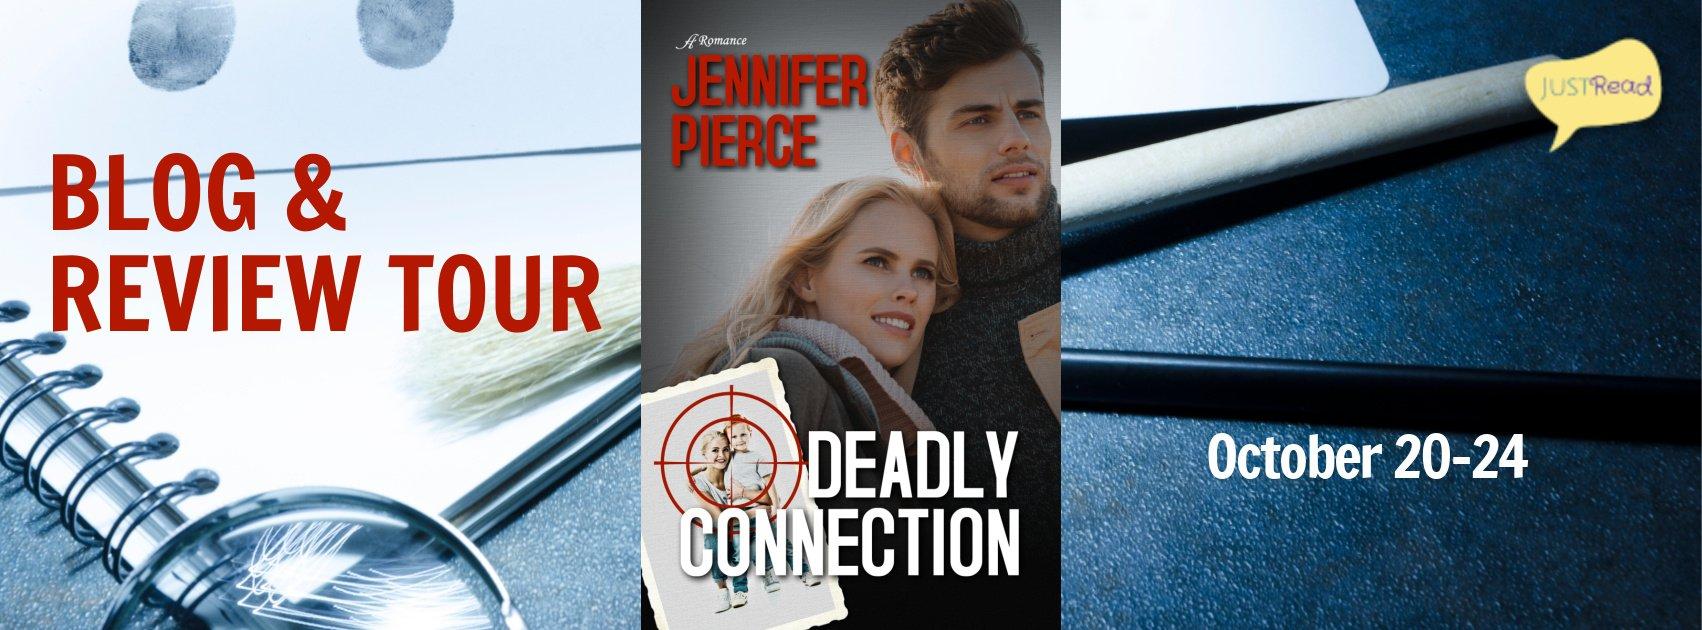 Deadly Connection Blog + Review Tour